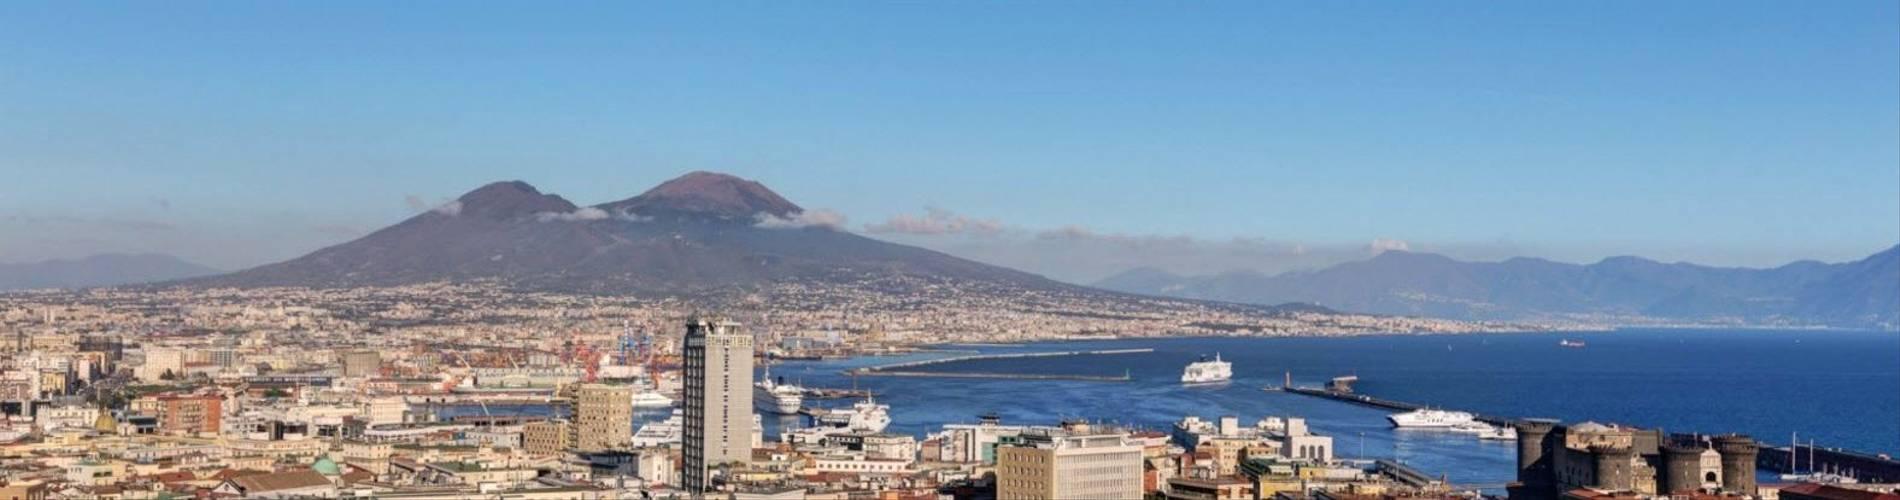 San Francesco Al Monte, Naples, Italy (2).jpg